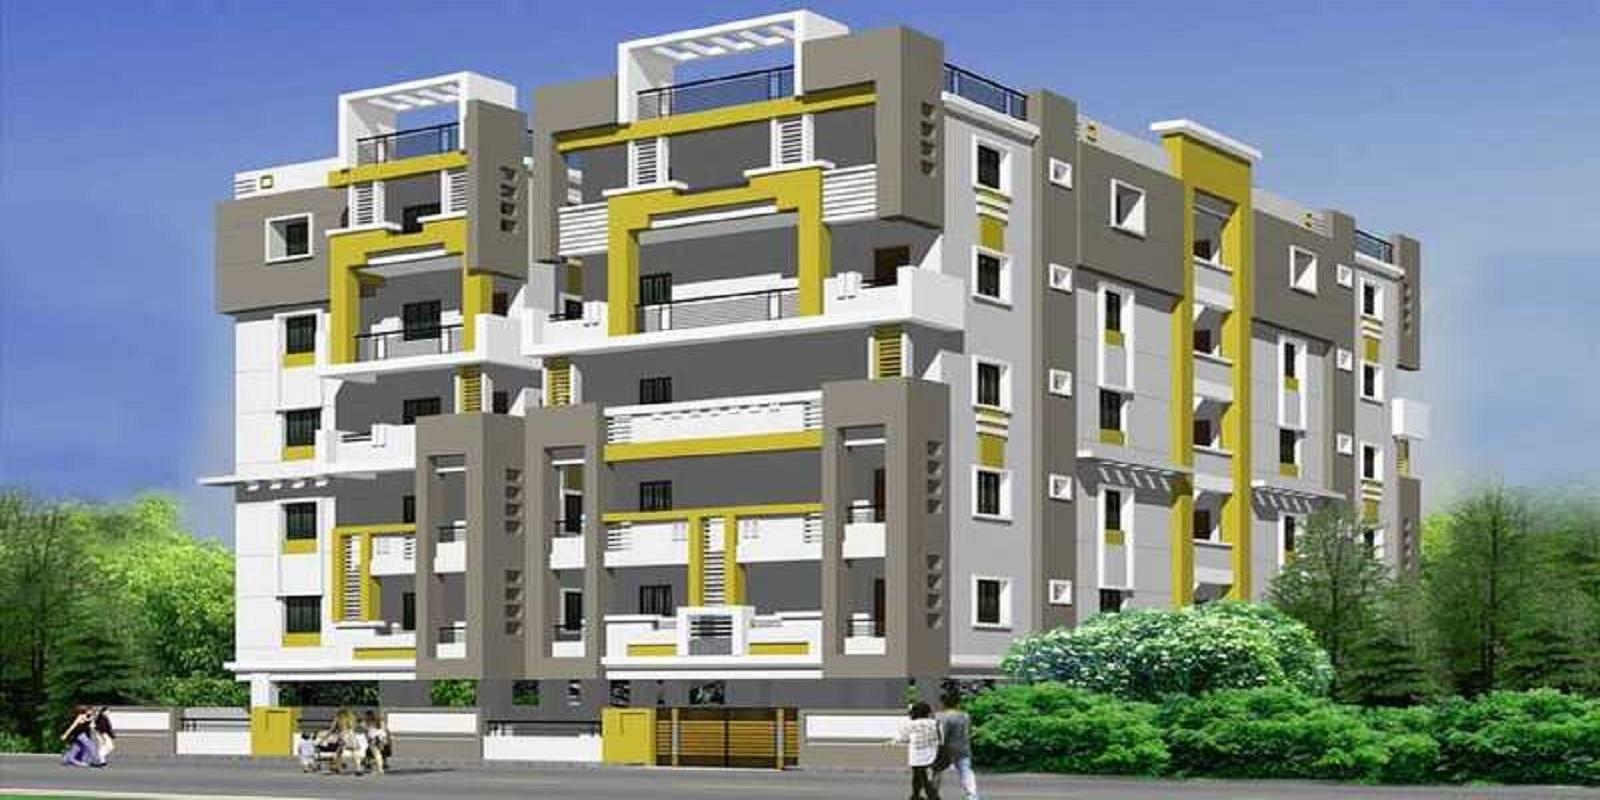 gruha kalyan erica project project large image1